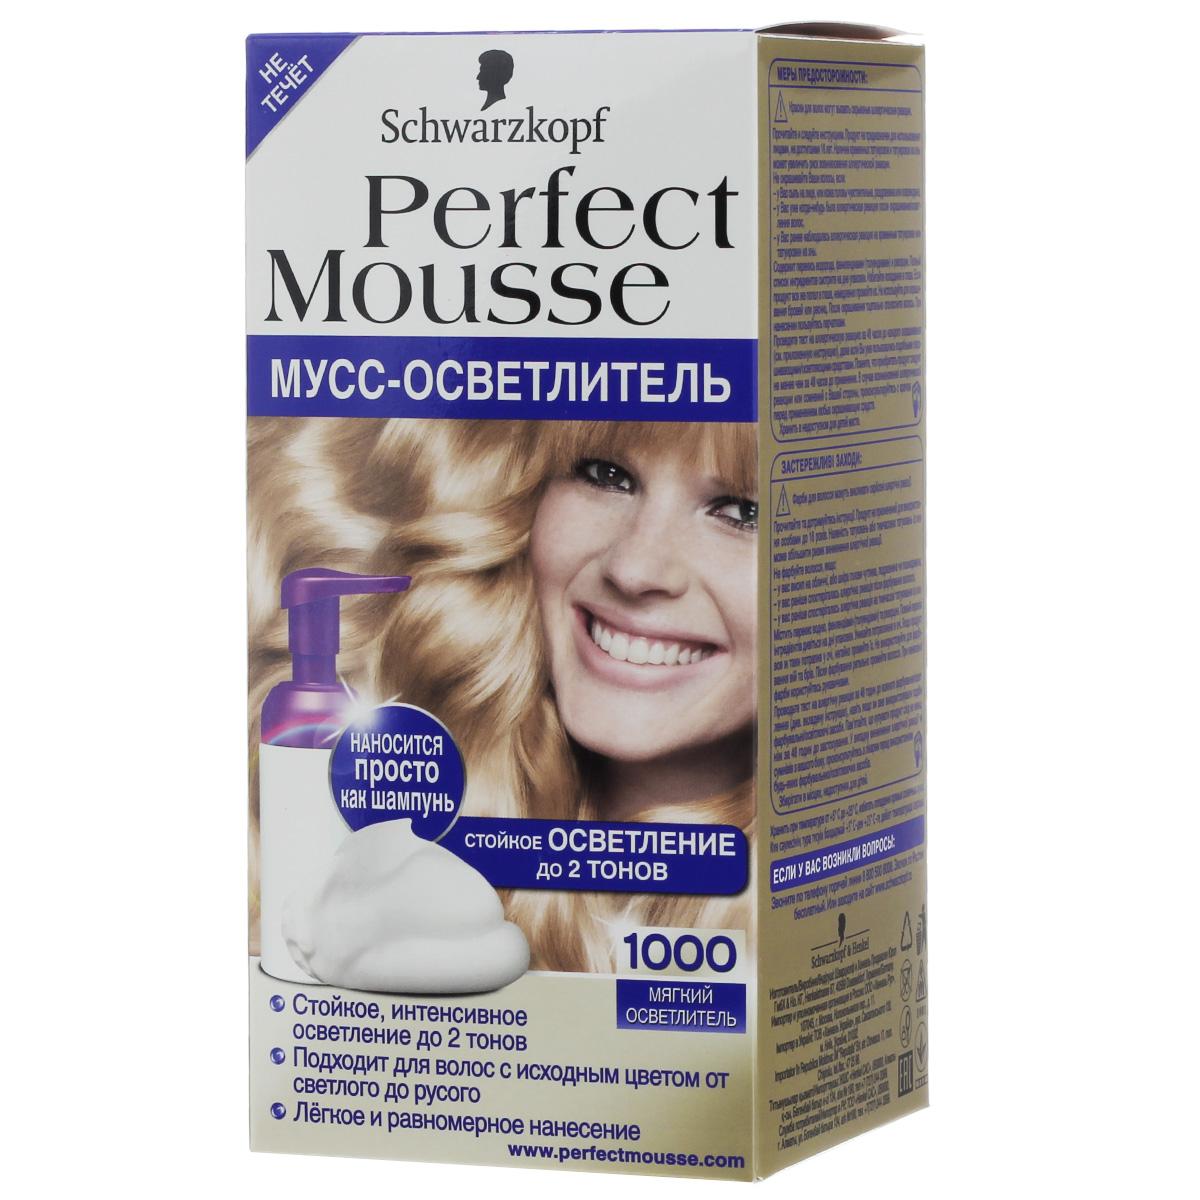 Perfect Mousse ������� ������-���� ������� 1000 ������ �����������, 35 �� - Perfect Mousse1802217�������� ������� ����������� ��������� �����! 100% ���������, 0% �������. ������ �������� ������ ��� ������ ������? ���������� ����� ������� ������! ������ ����������� � ����������� ��������� ��� �������� ��������� �������� �������-����������� � ���������� �������� �����. � Perfect Mousse �������� ���������� ����� ���������� �����!